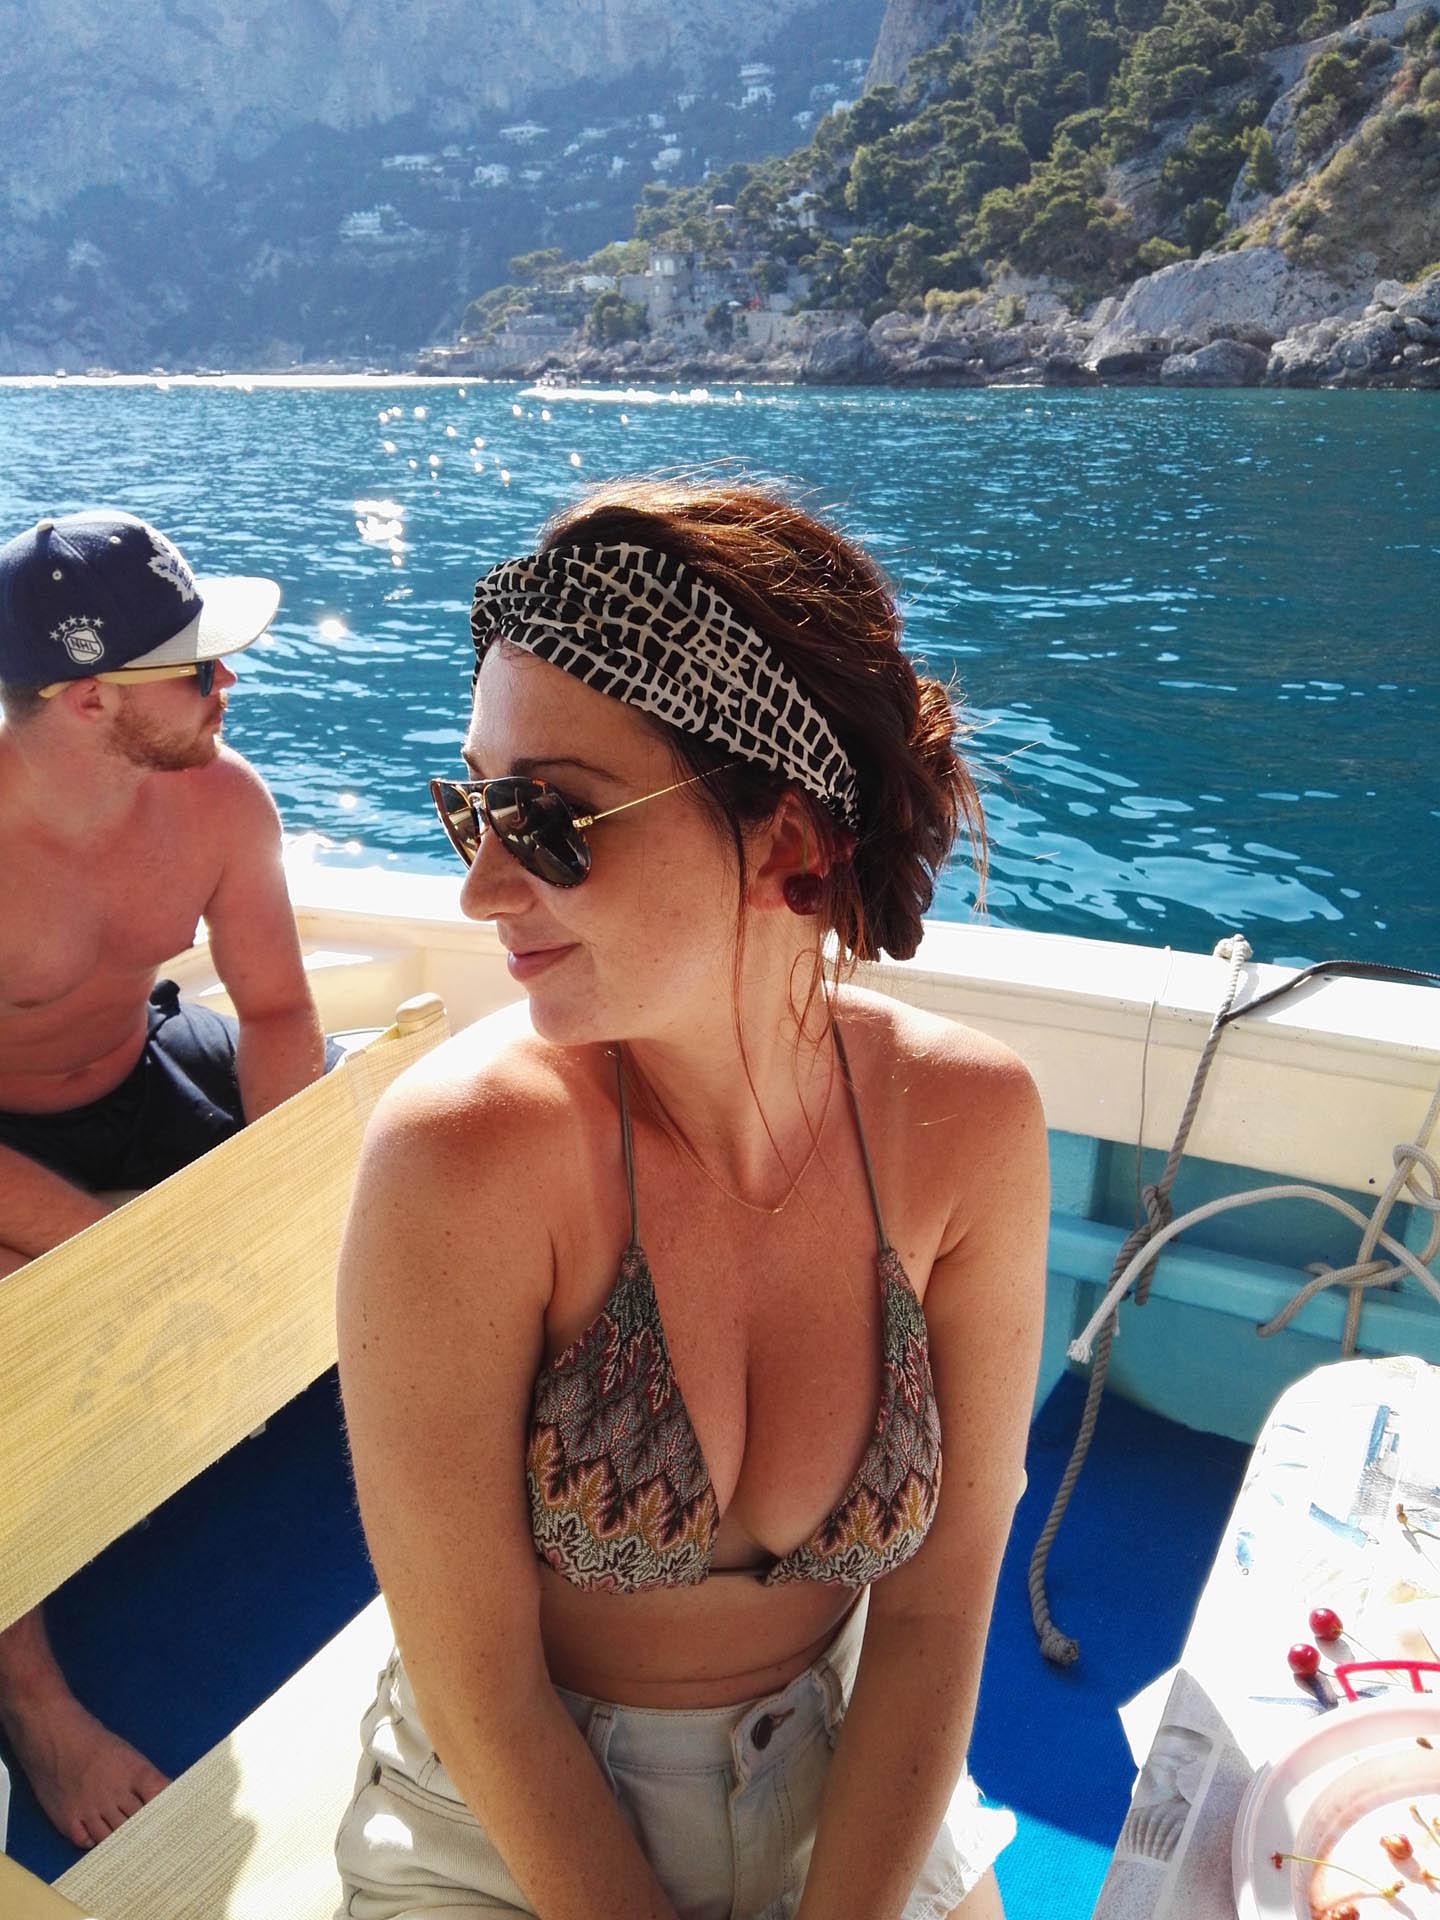 Boat tour to Capri from Sorrento